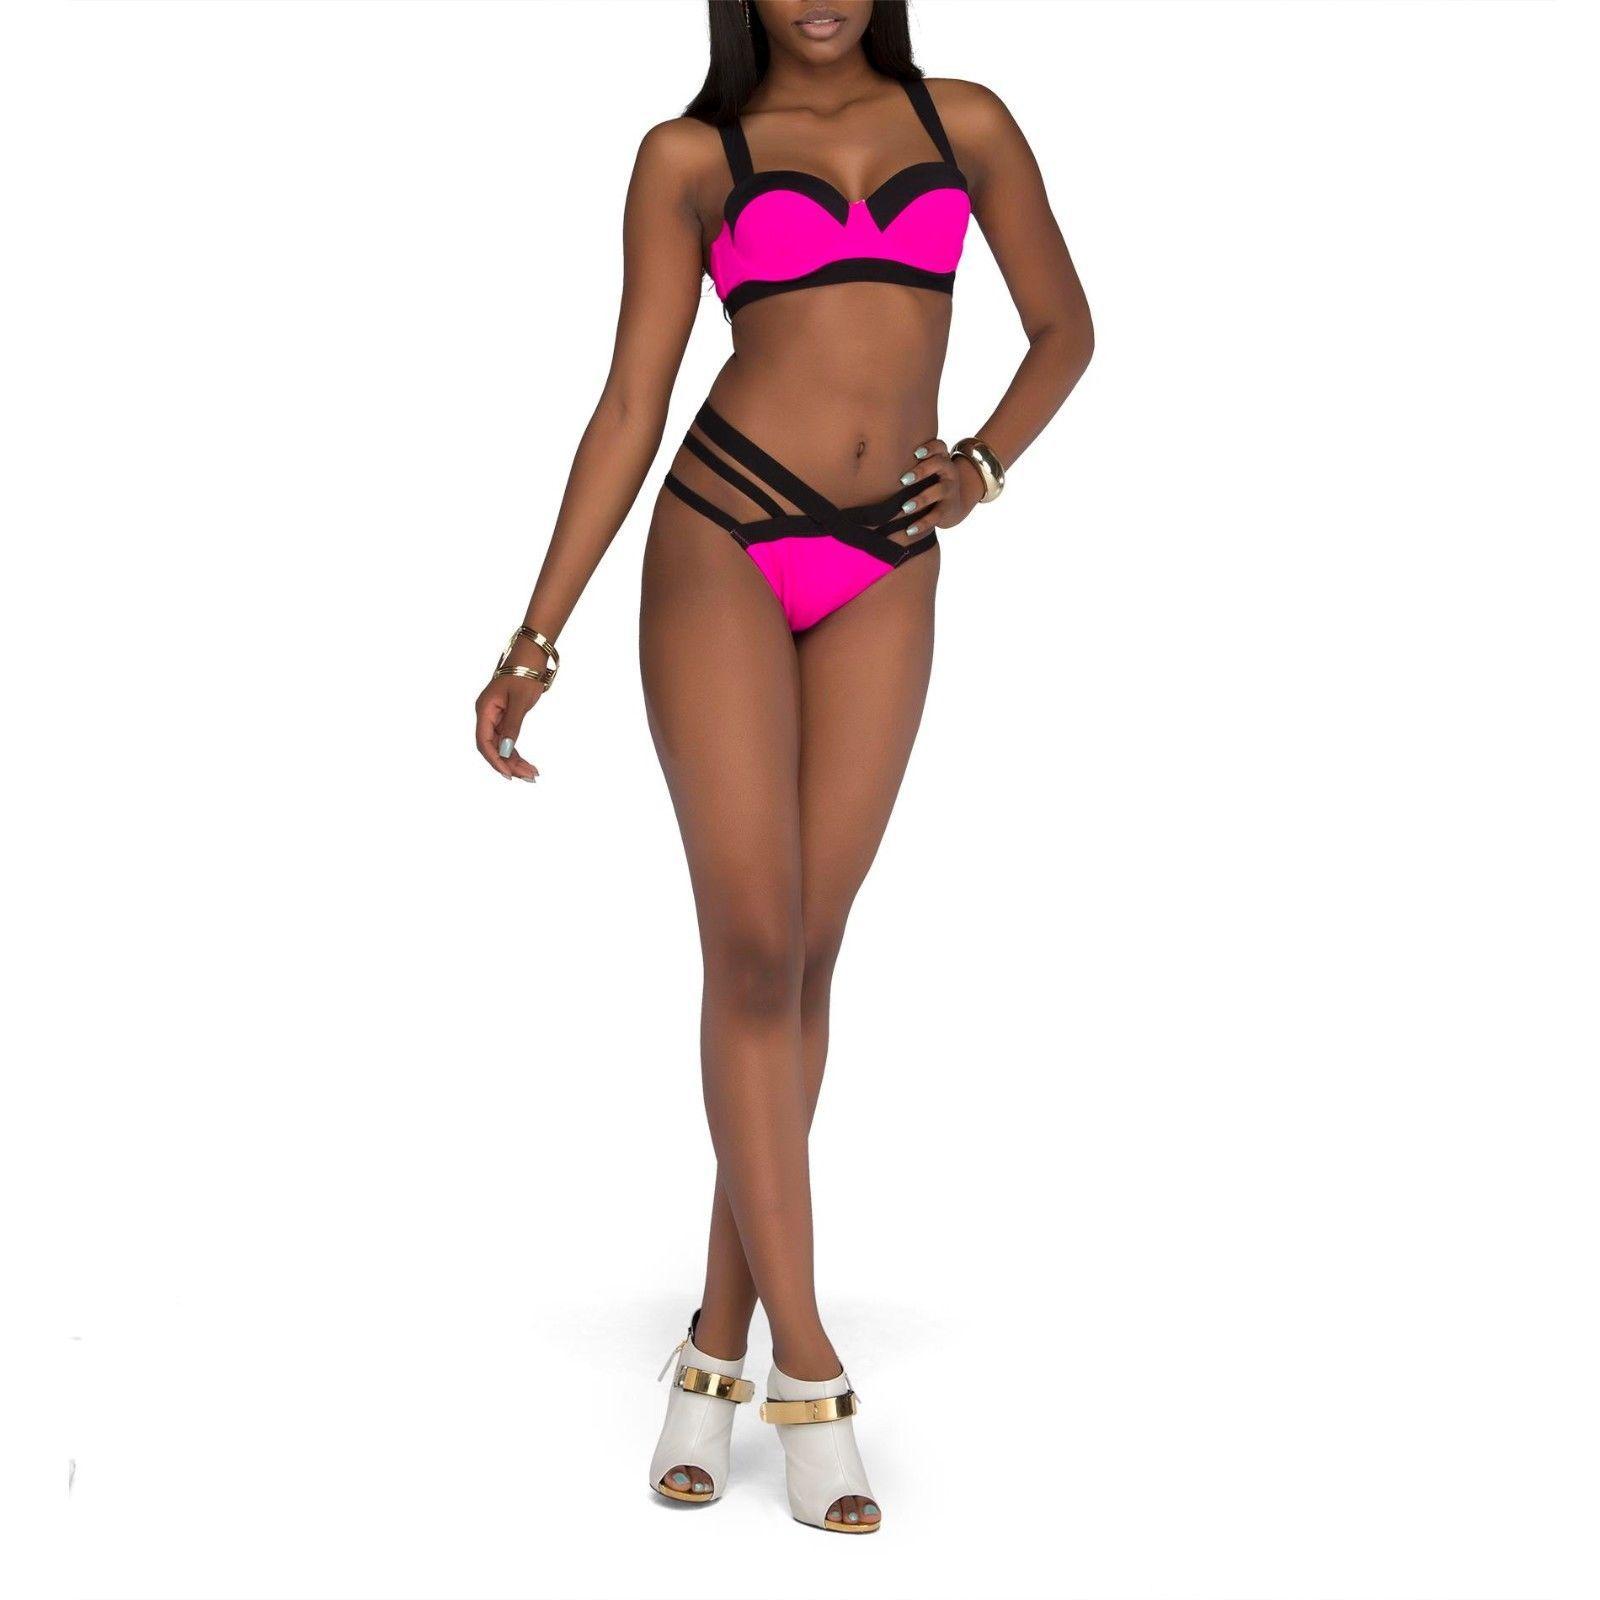 74b3d3e08fb Nicki Minaj Adds New Swimwear Line to Her Kmart Collection | CHE LESHEA